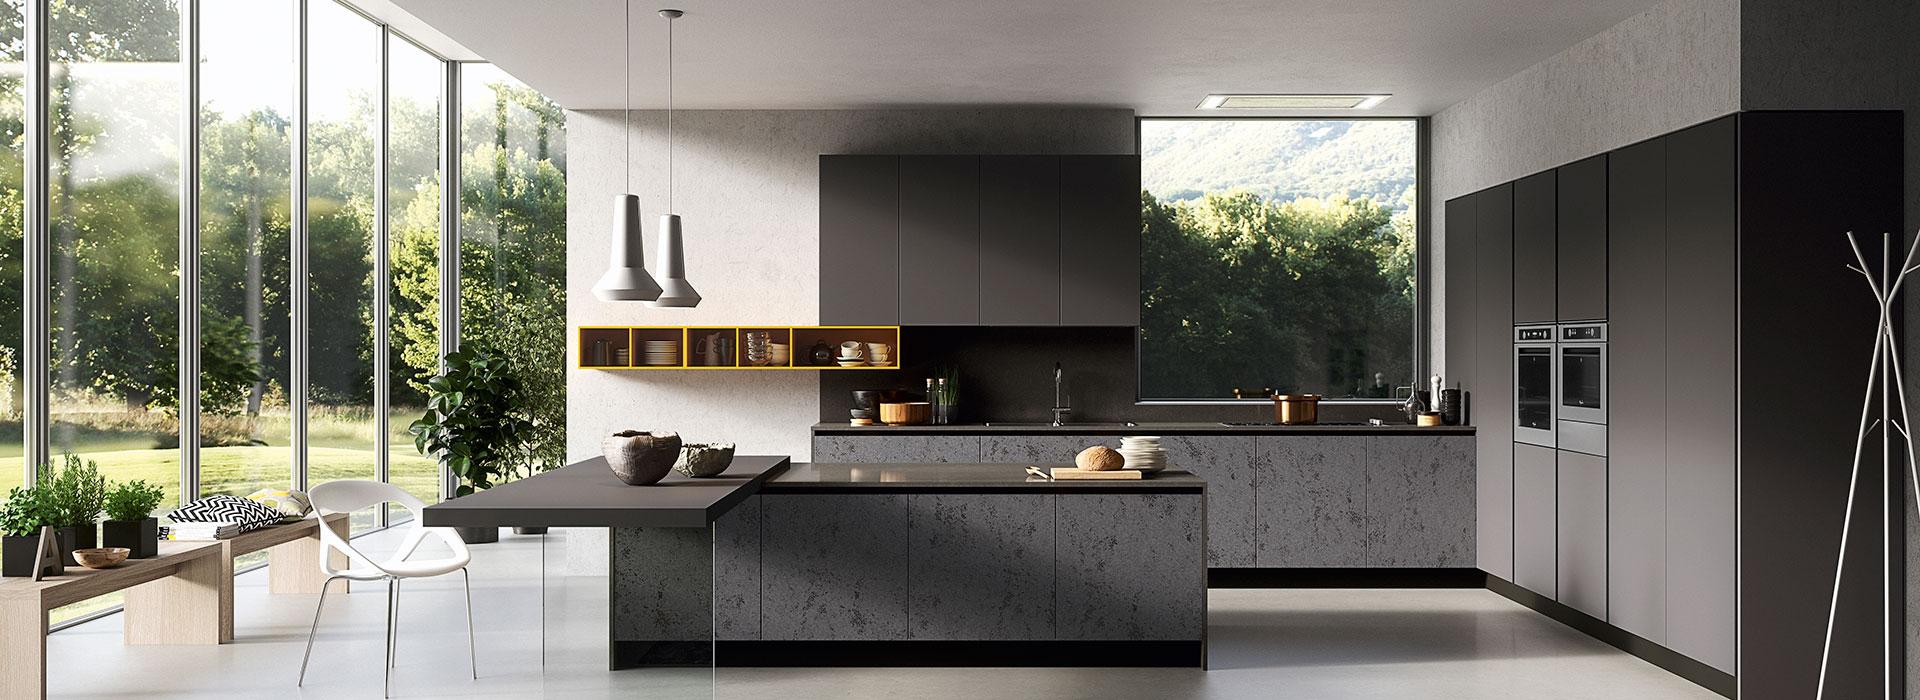 Arredamenti cucine classiche e moderne - Minoia Arreda